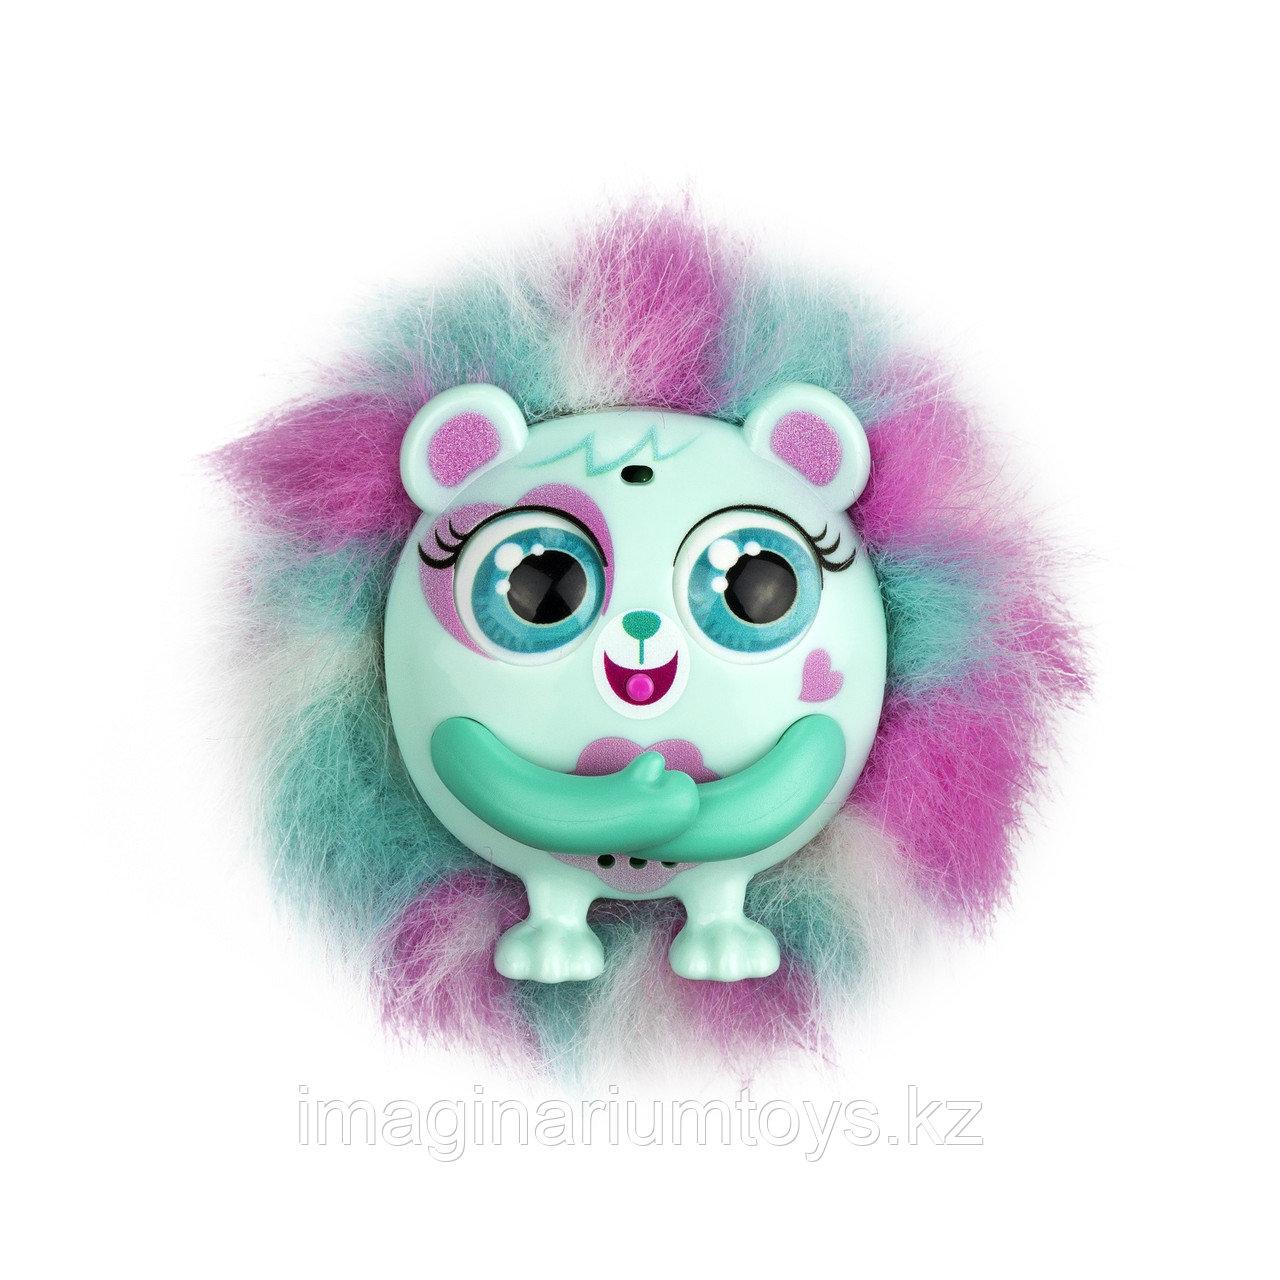 Игрушка Tiny Furry интерактивный питомец Mint